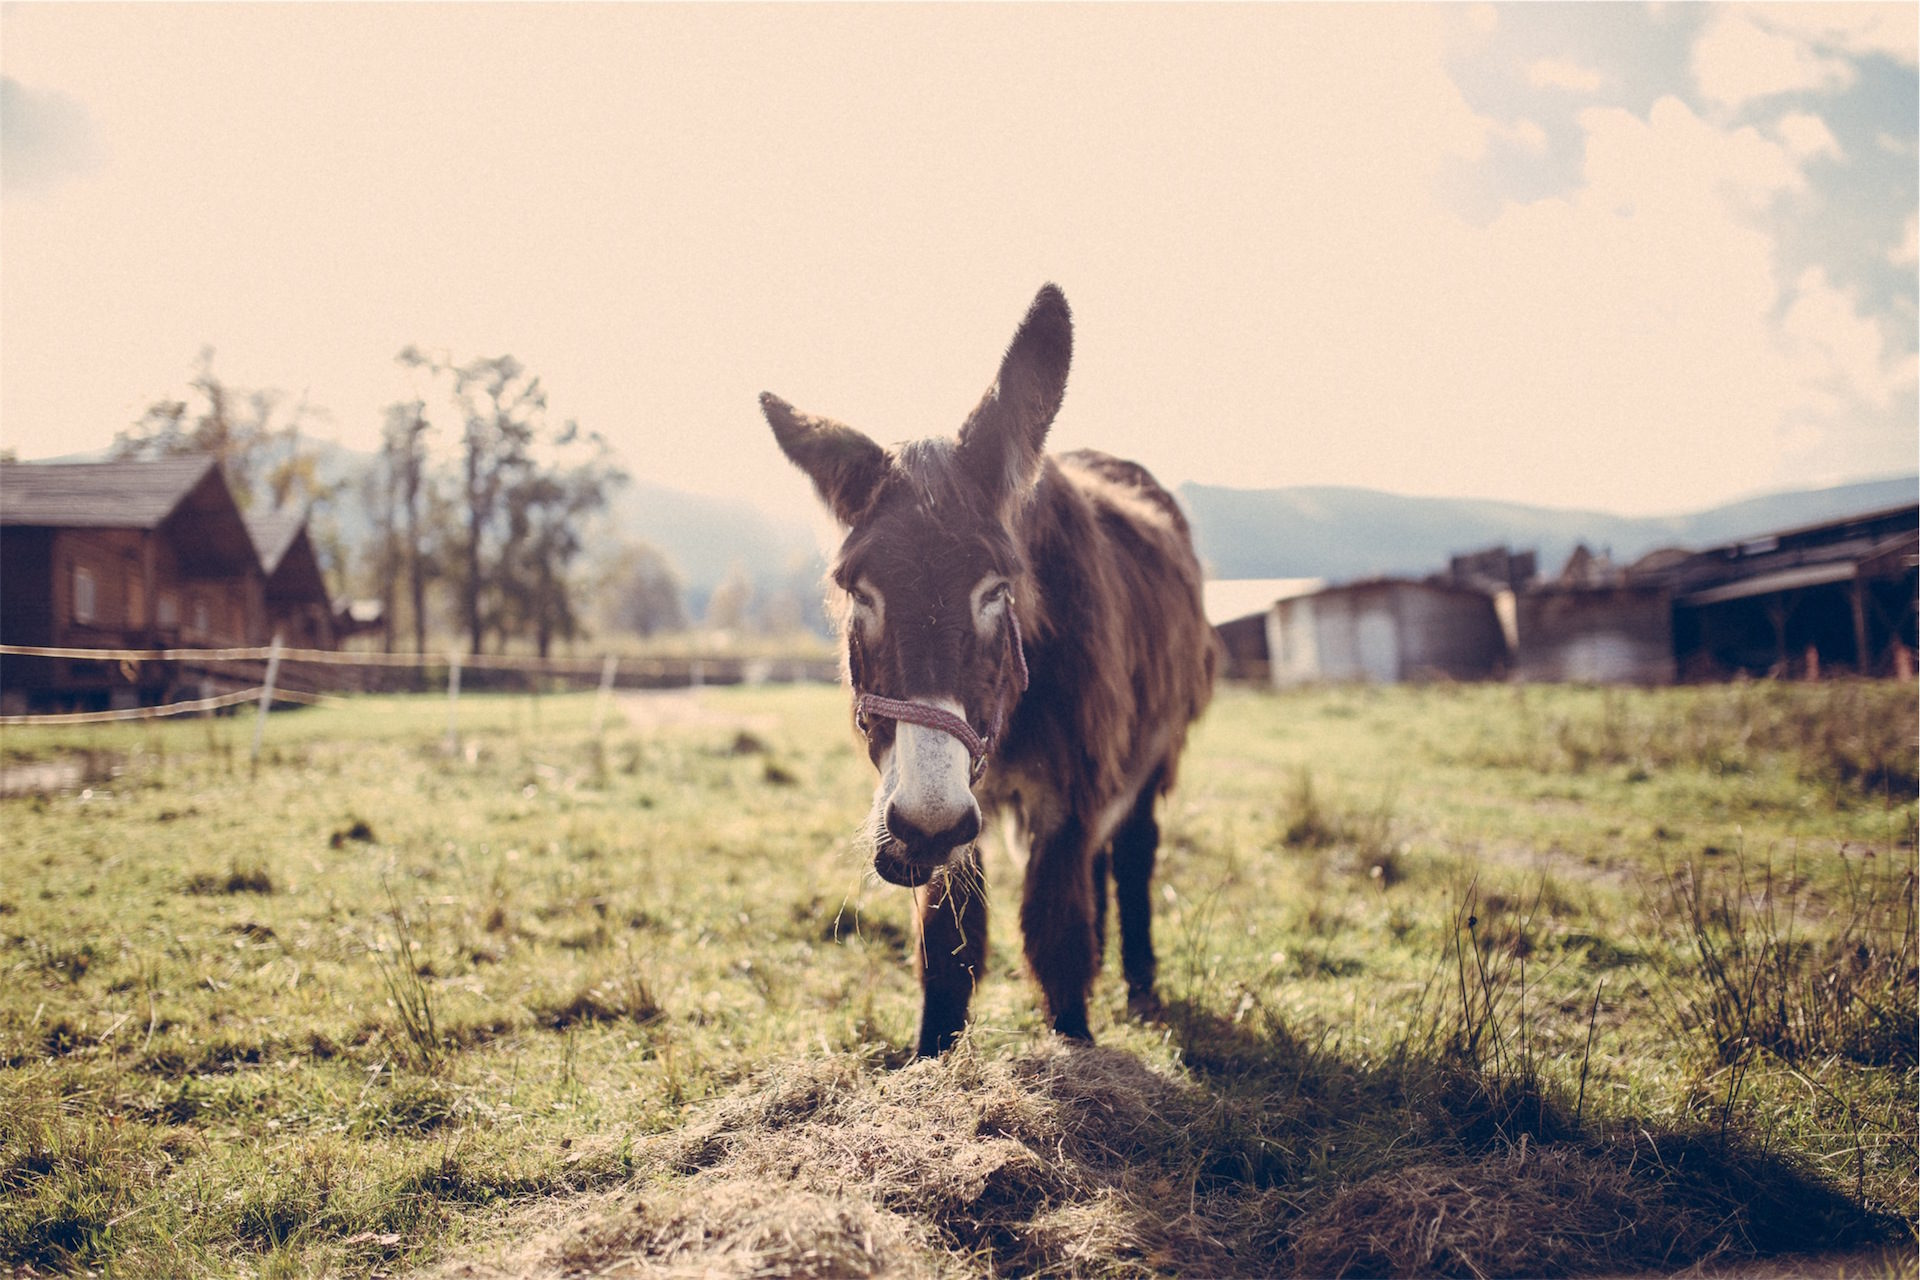 burro, asno, 累了, 食品, establo - 高清壁纸 - 教授-falken.com